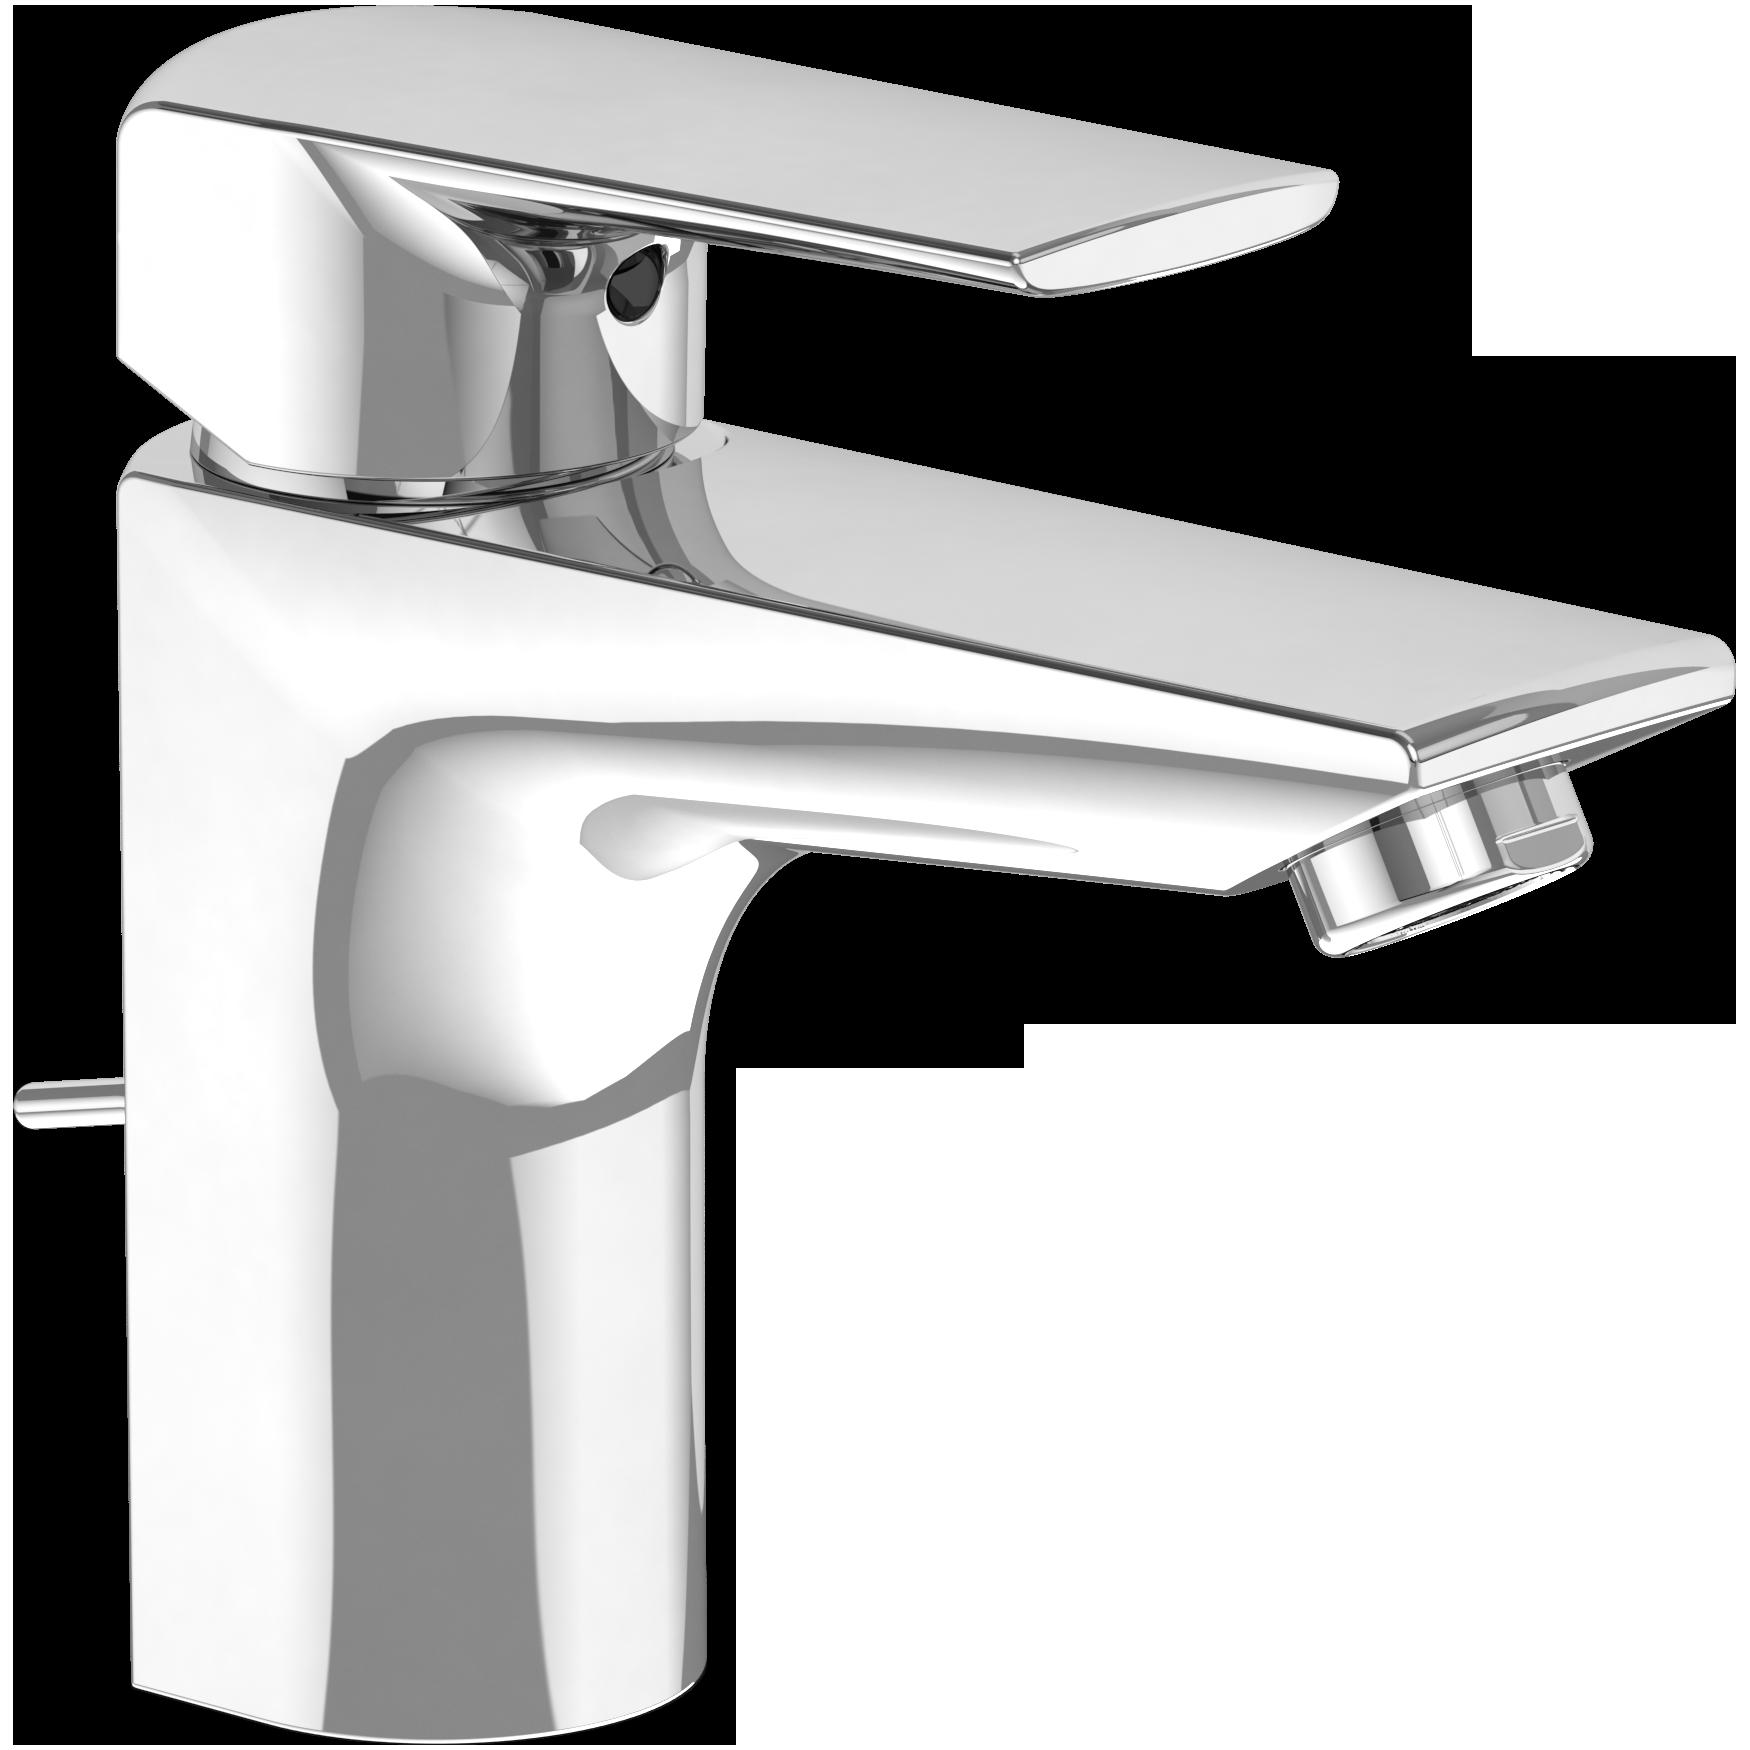 subway 2 0 single lever basin mixer tvw10210111061. Black Bedroom Furniture Sets. Home Design Ideas